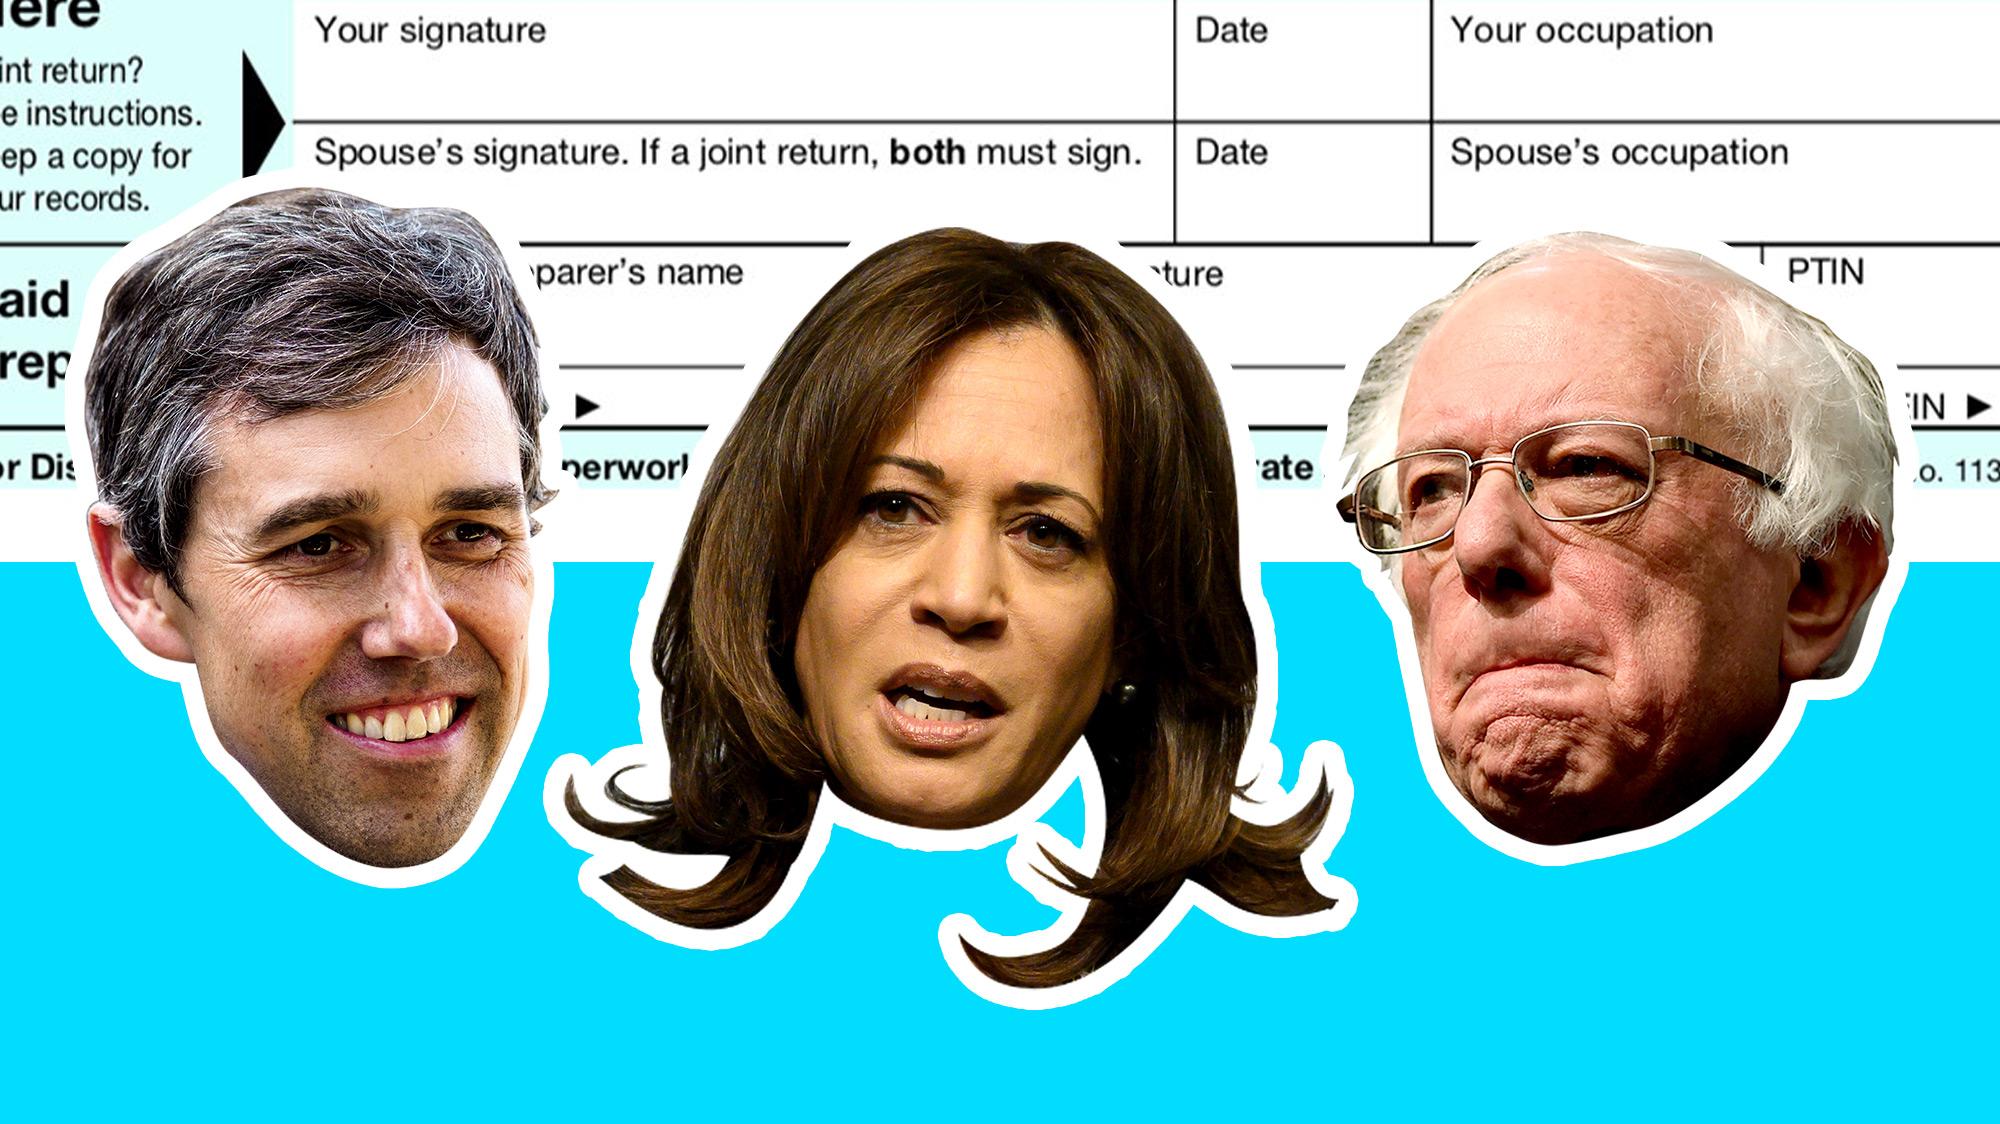 Best free dating websites 2020 election